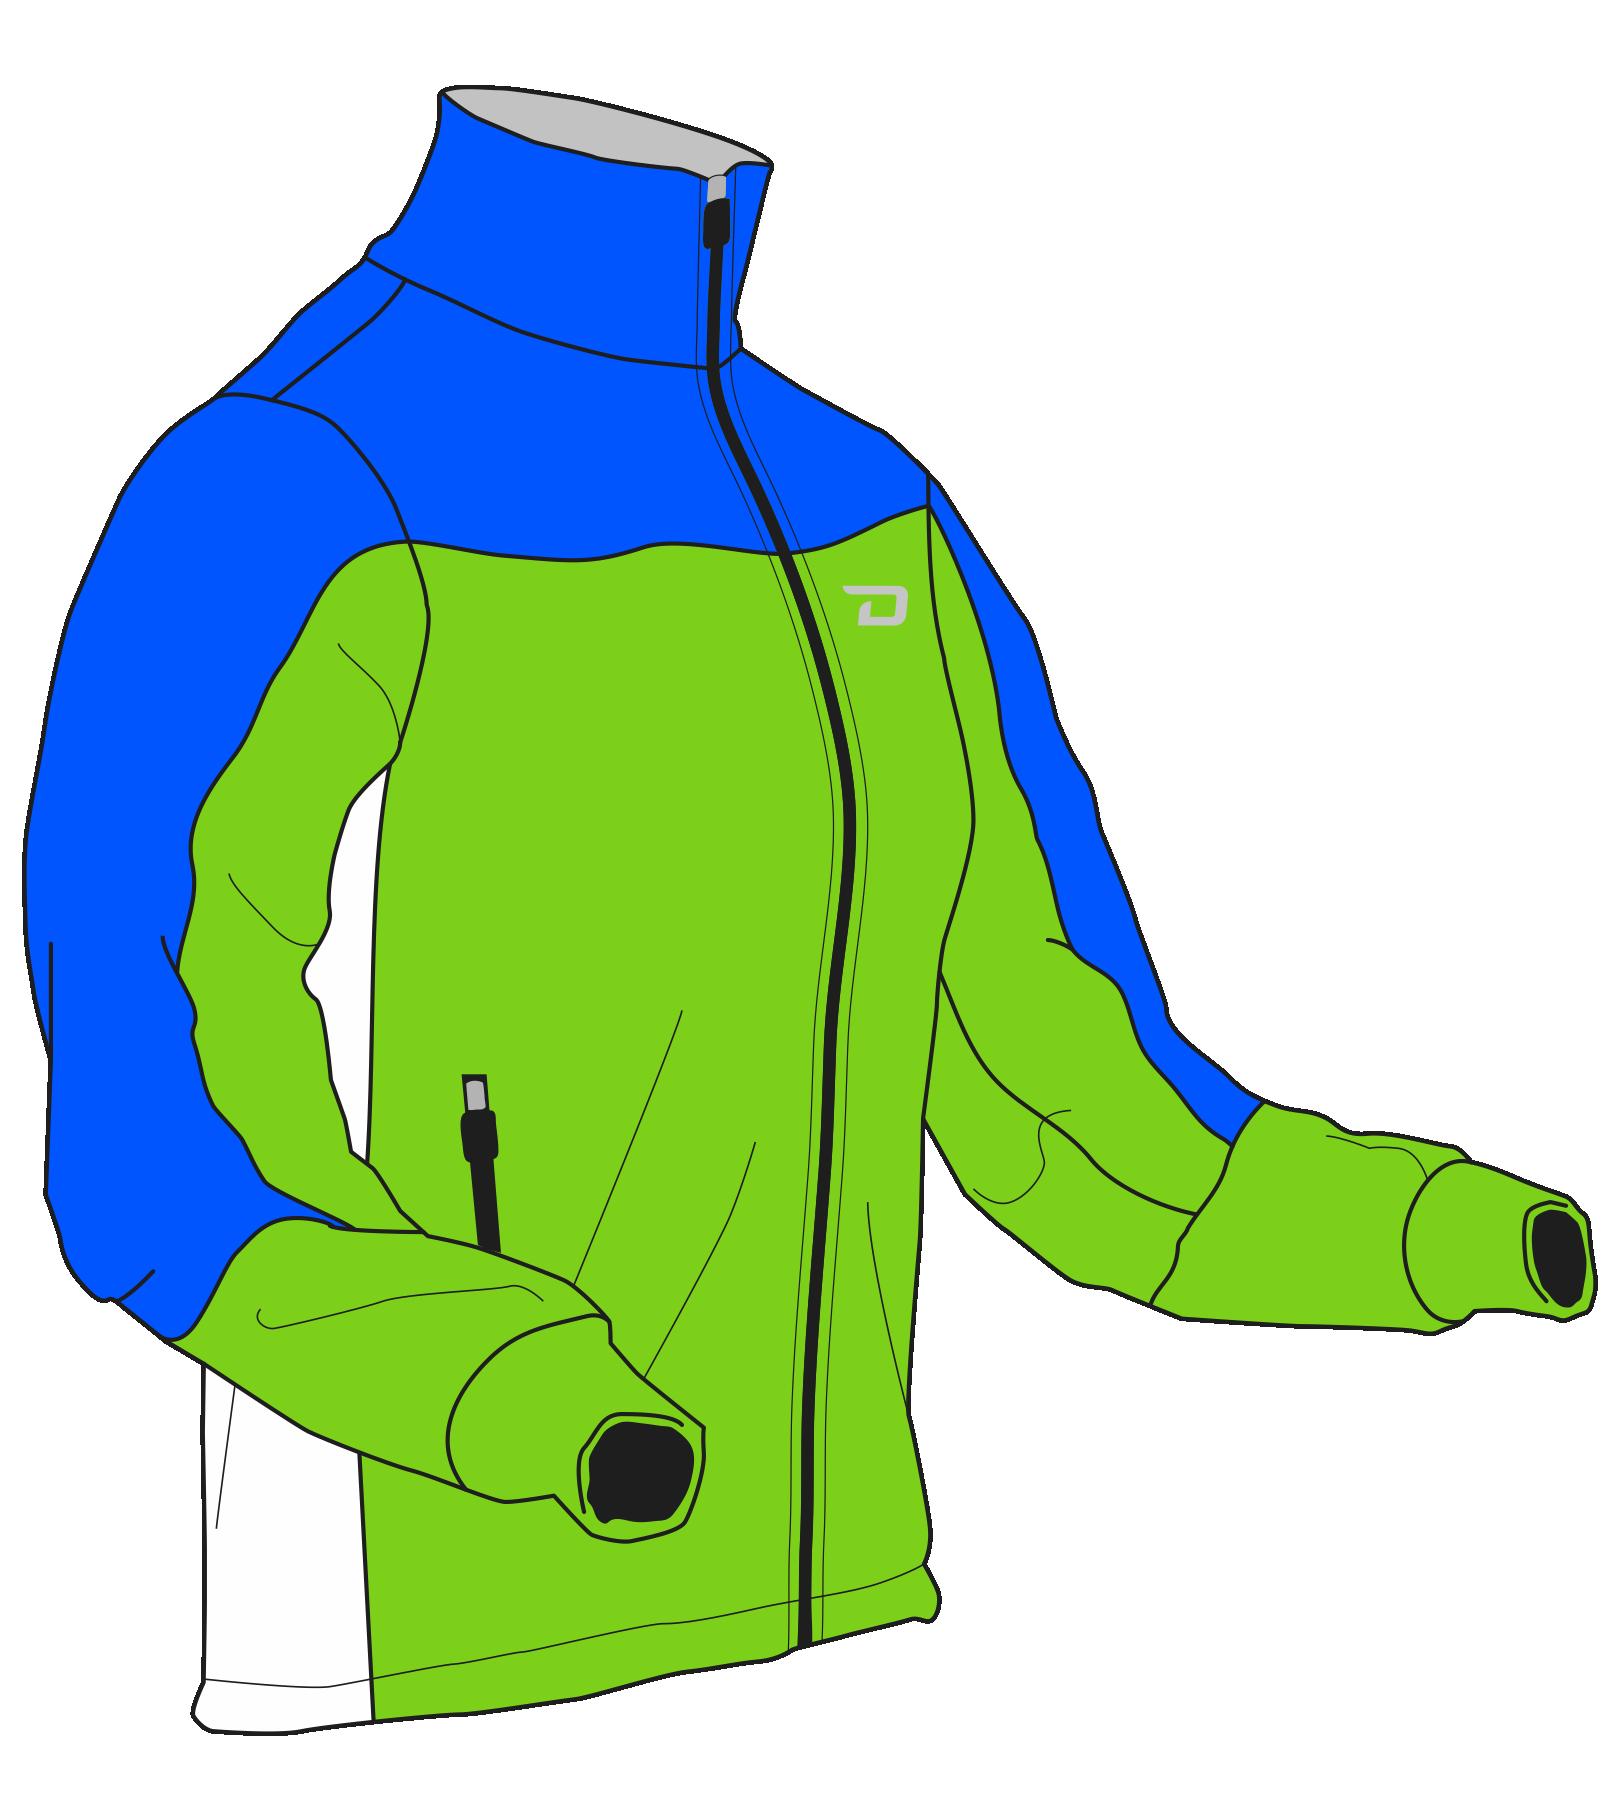 D001 – Giubbino Racing